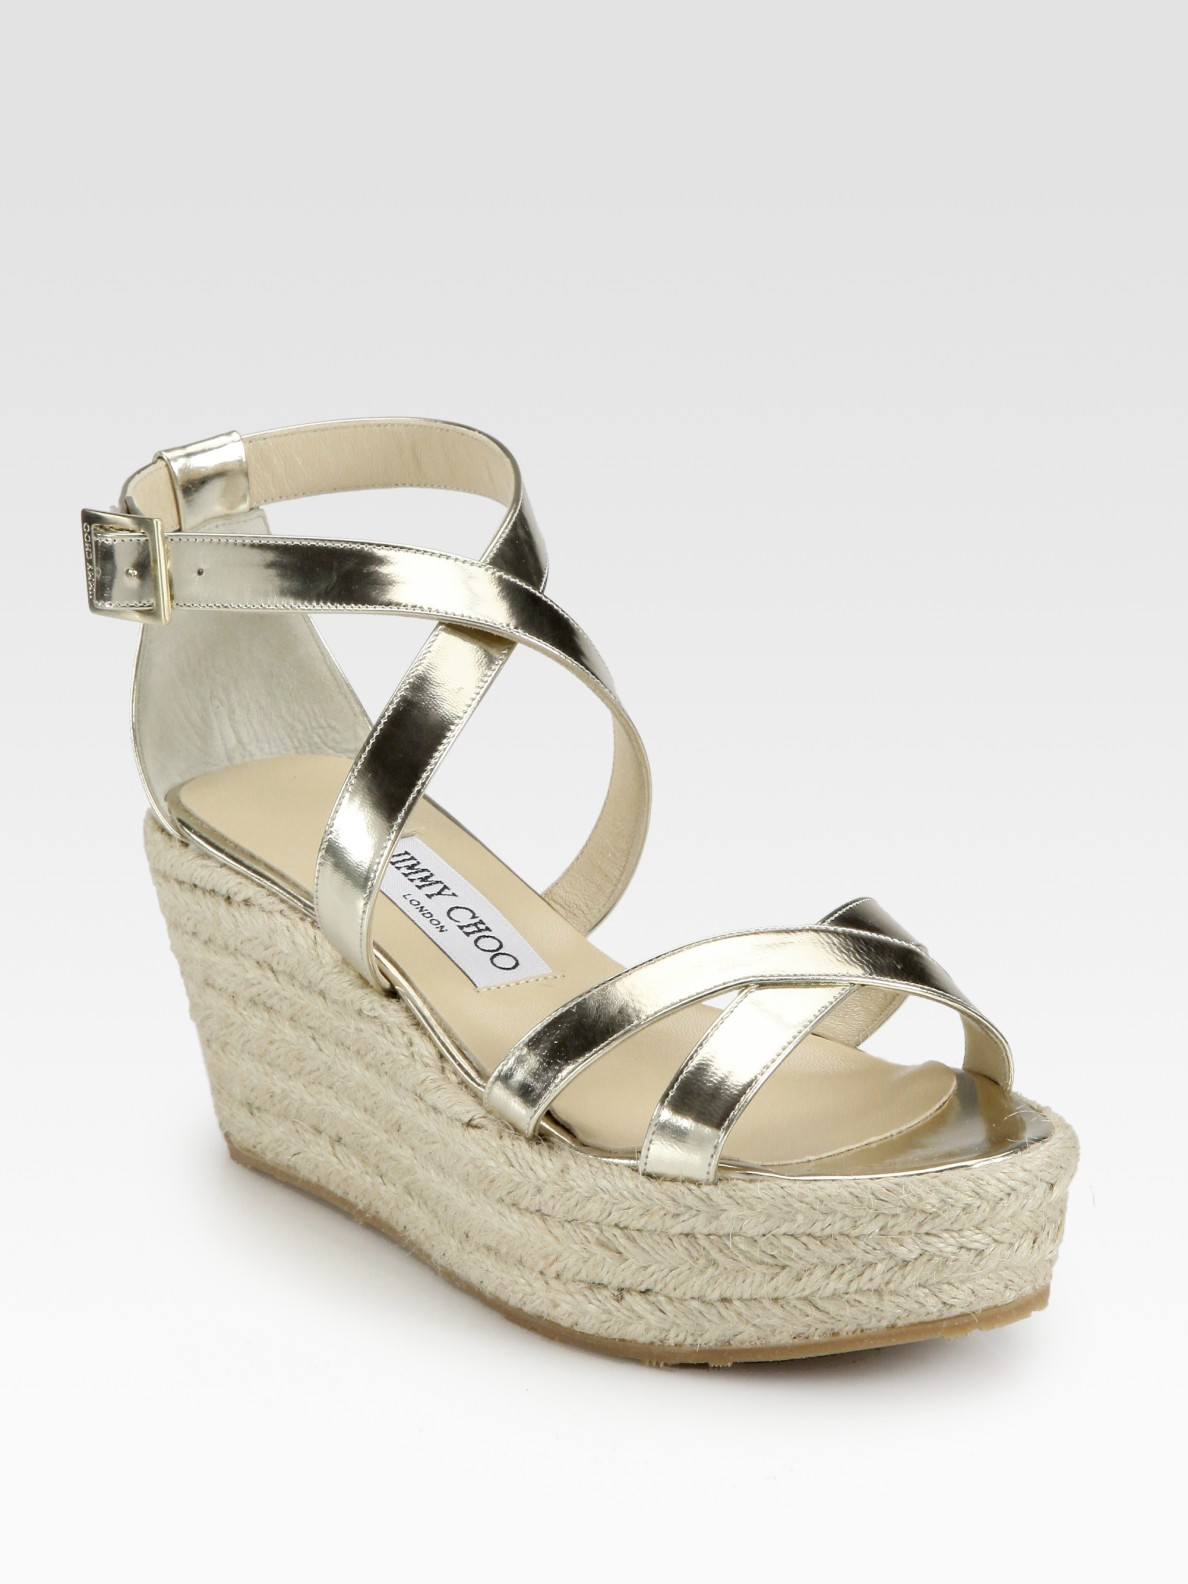 Jimmy Choo Poria Metallic Leather Espadrille Wedge Sandals